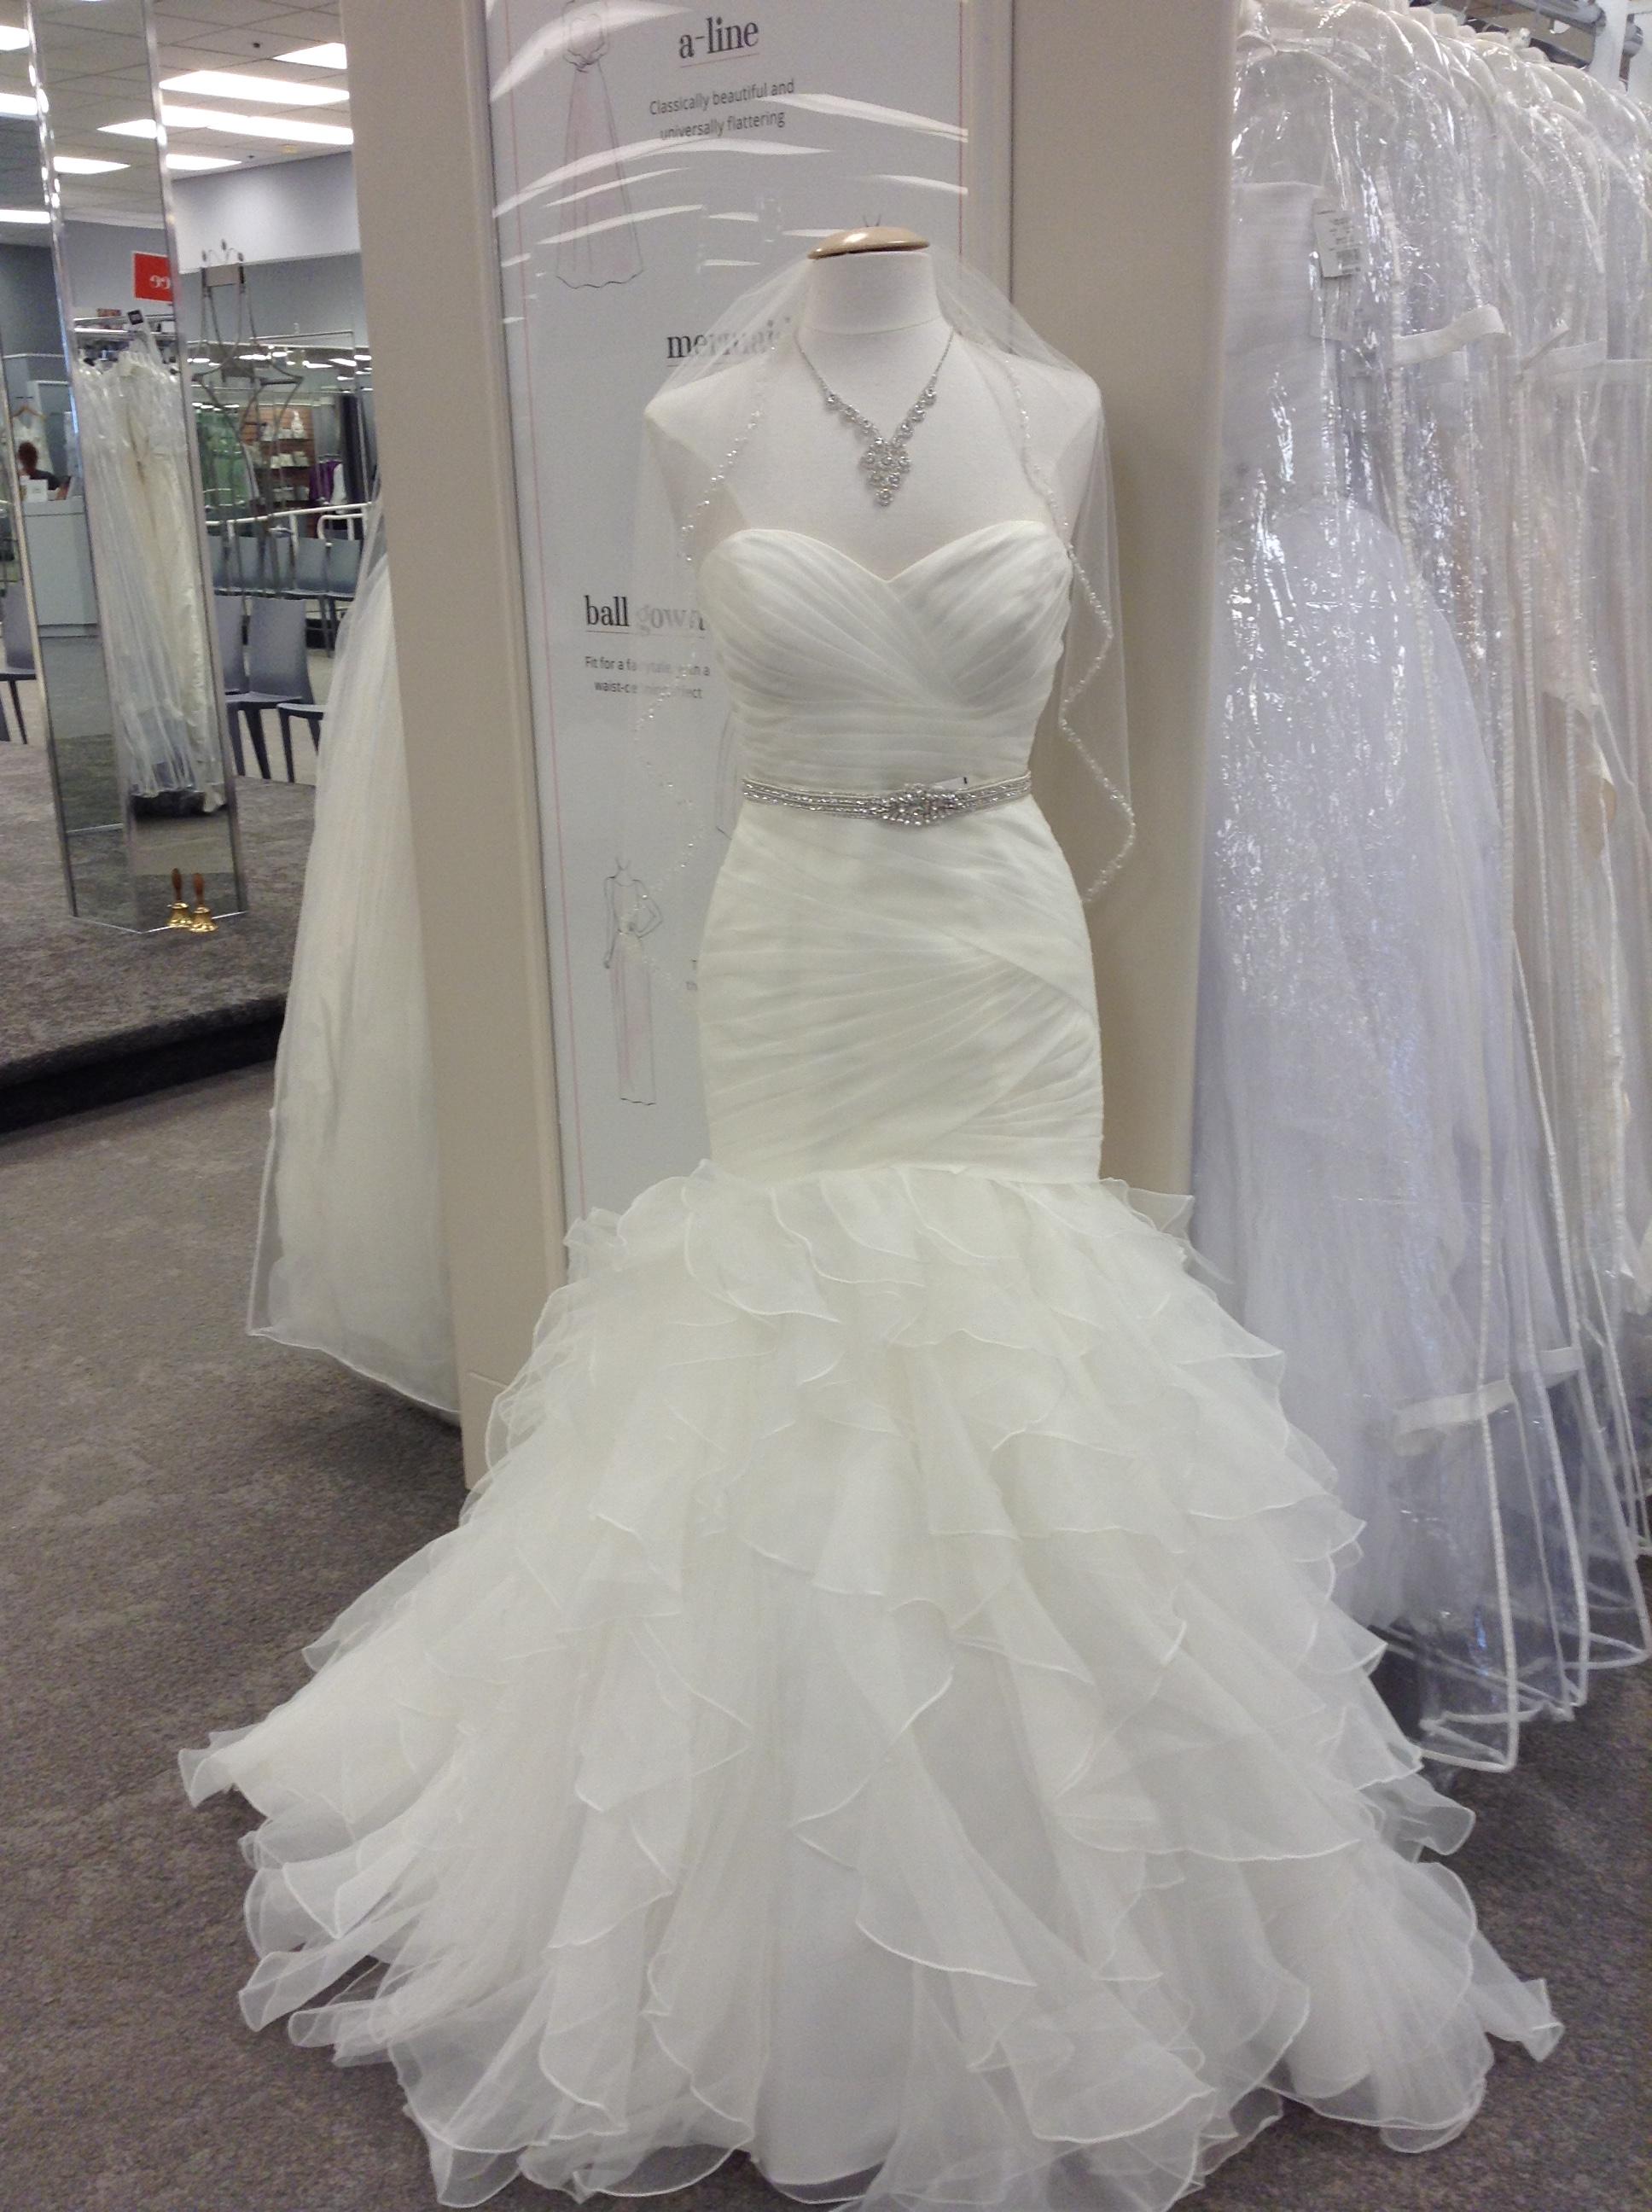 David's Bridal image 15